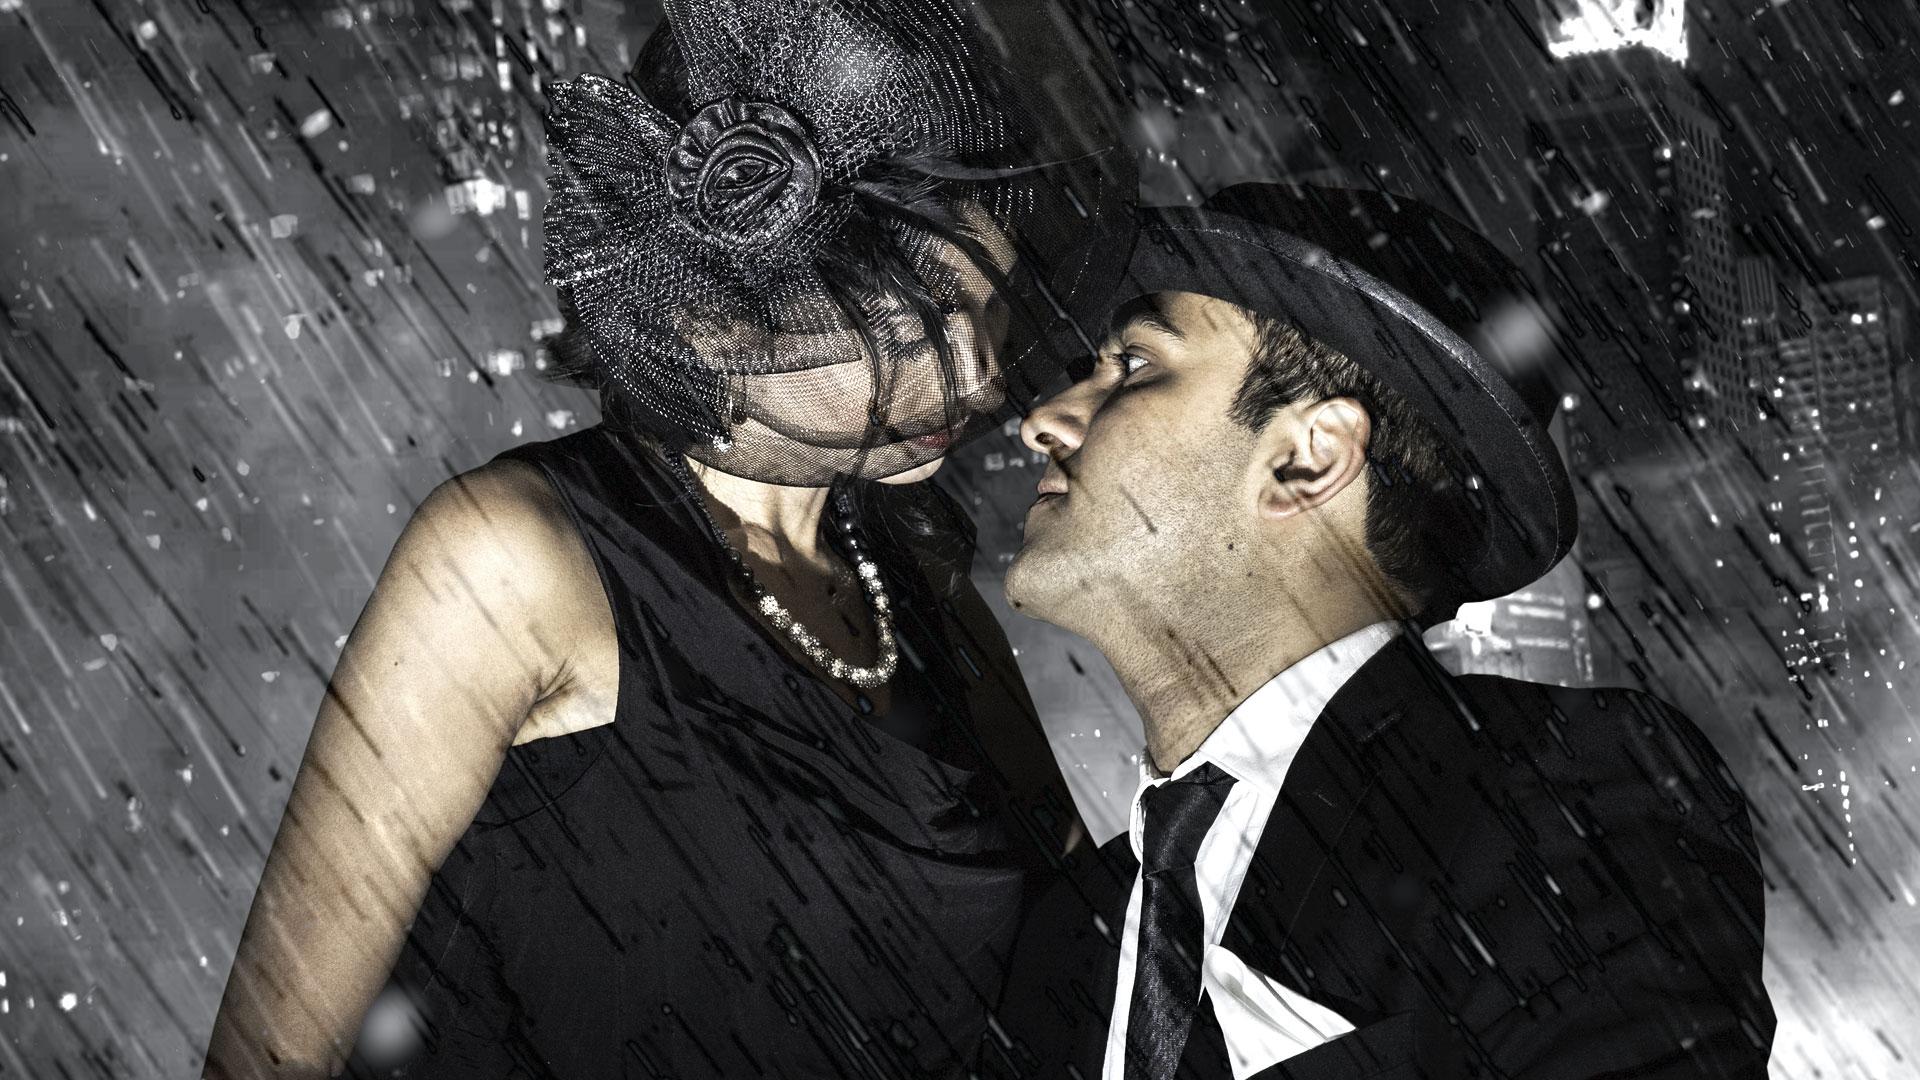 epic_sky_pictures_eshoot_photo_film_nior_sin_city_photography_rain_passion_love_candid_buildings_blackandwhite_agent_dramatic_black_hat-2